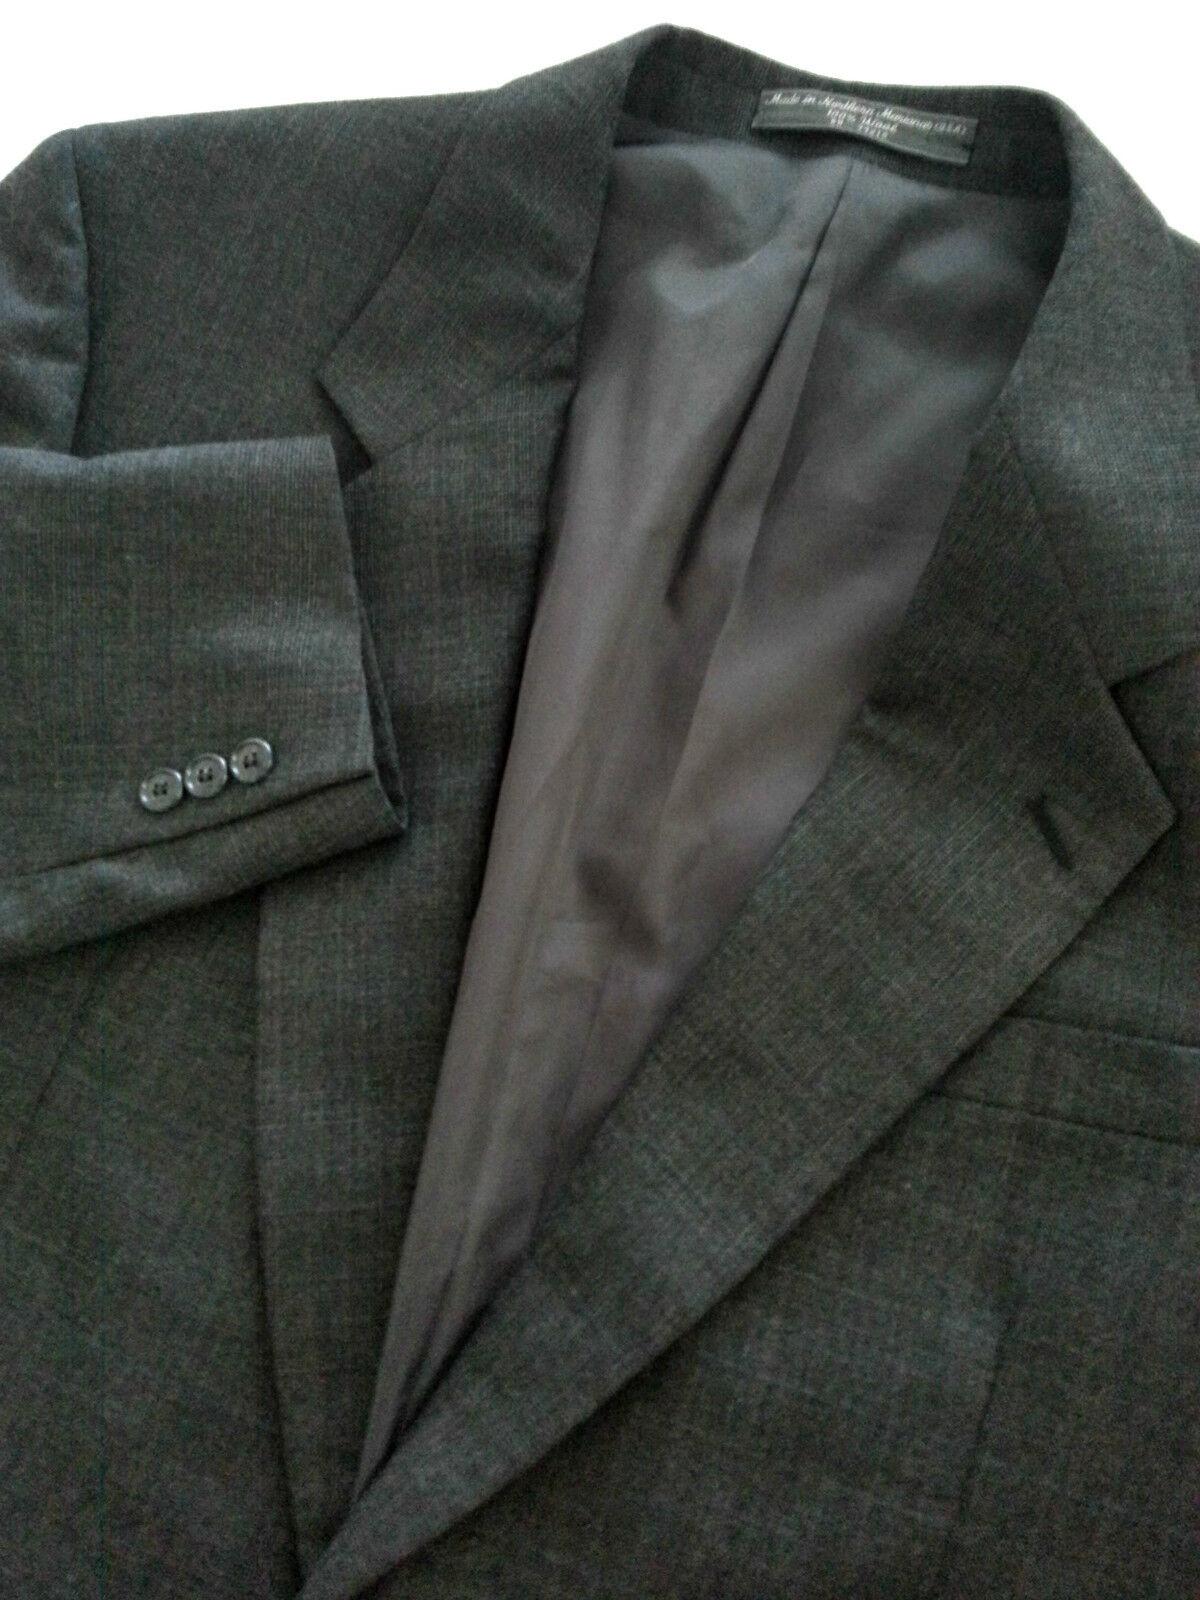 Joseph & Feiss International Men's Charcoal 2 Button Blazer Sport Coat Size 44L